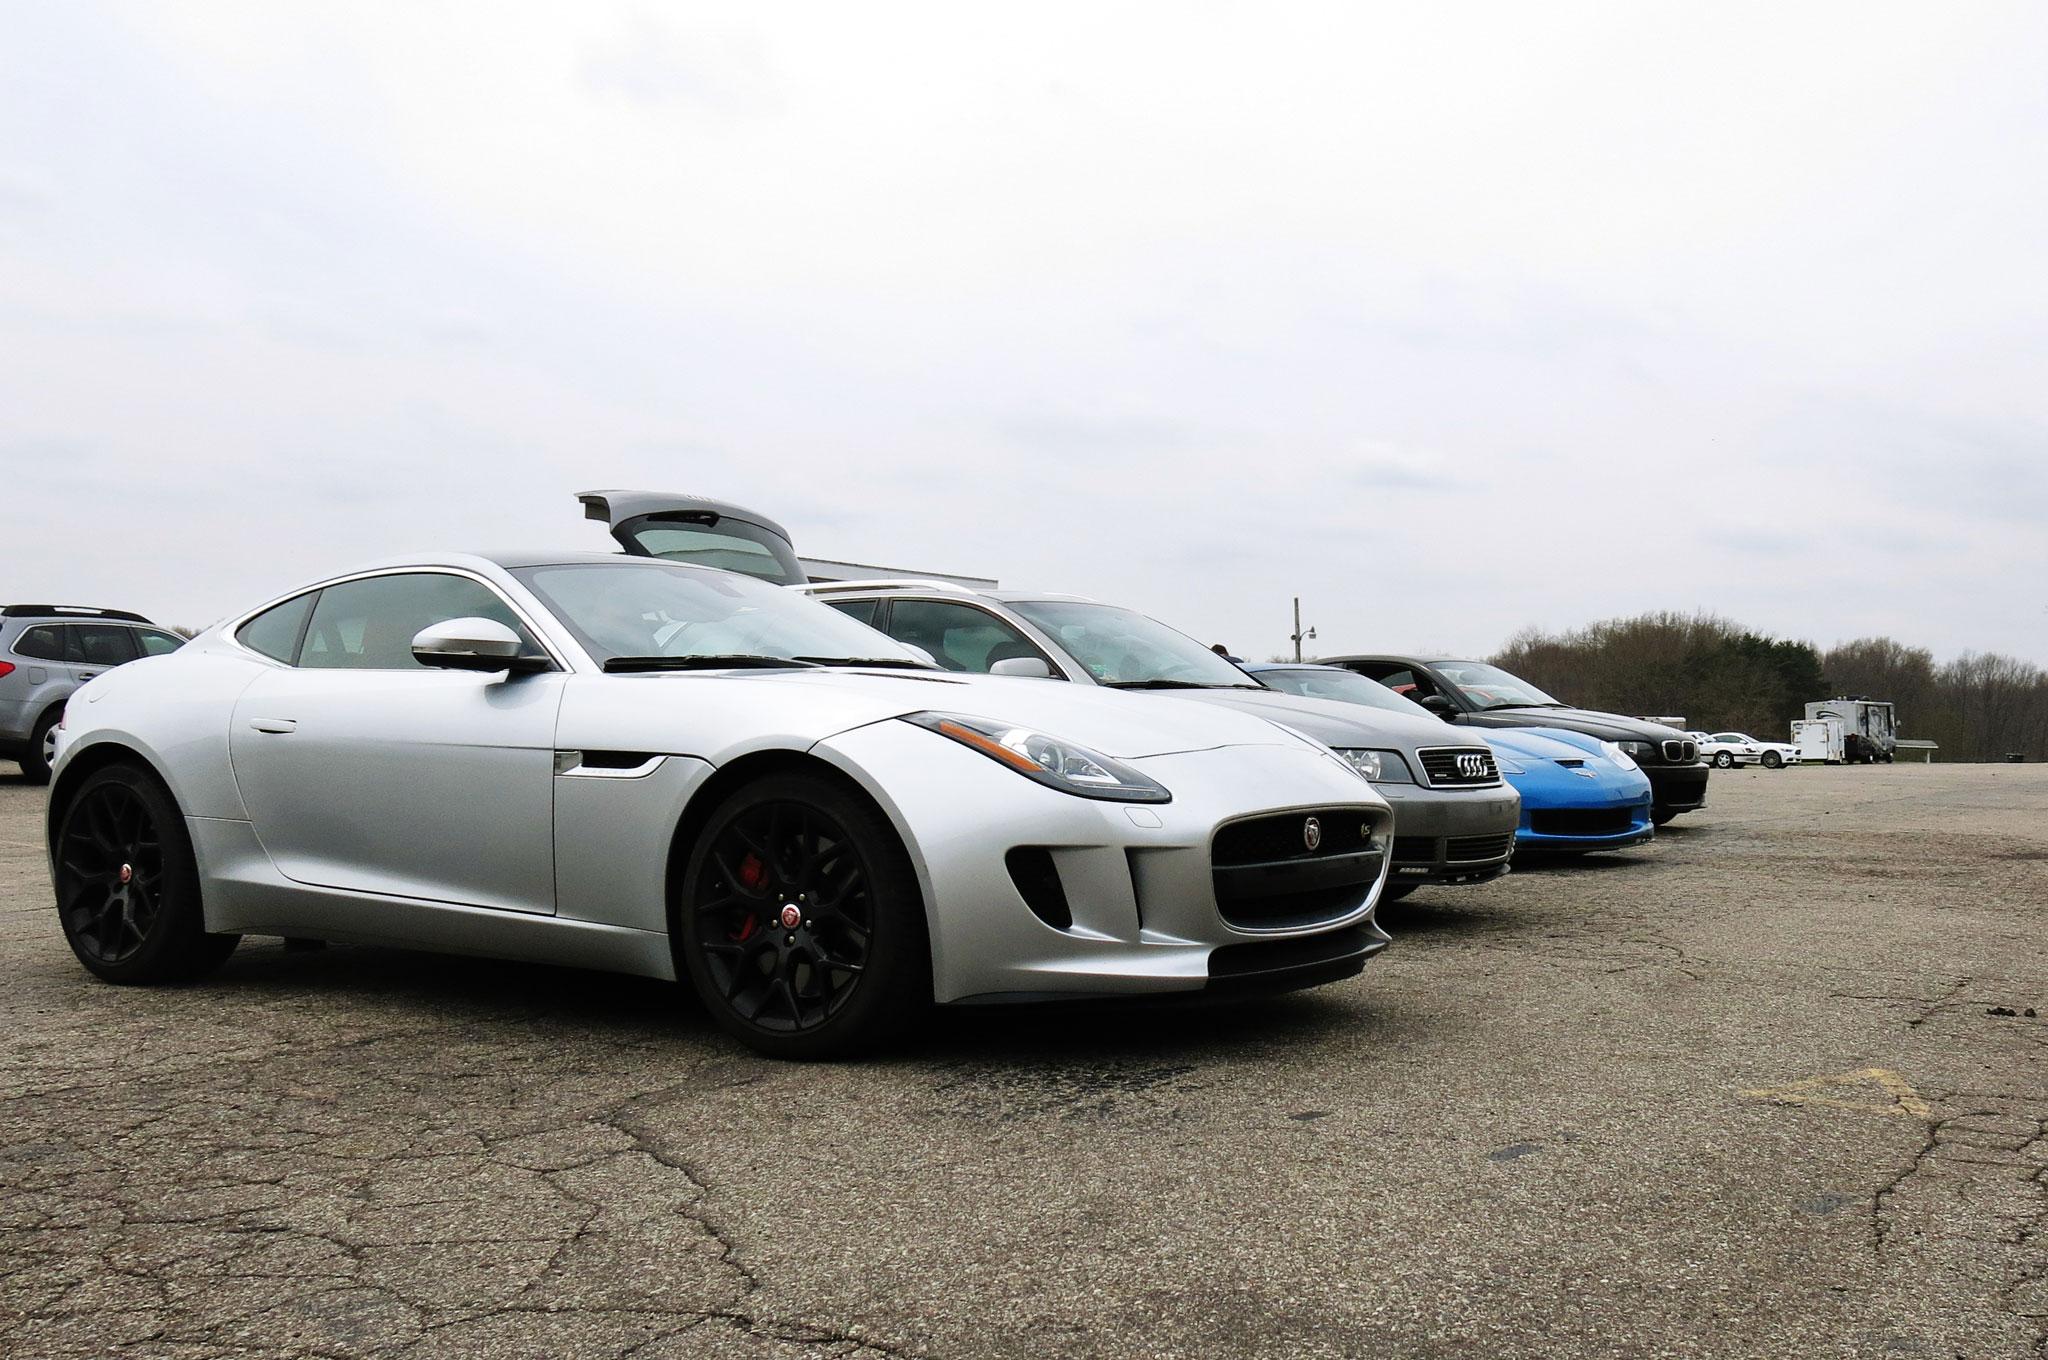 2015 jaguar f type s coupe track night in america. Black Bedroom Furniture Sets. Home Design Ideas